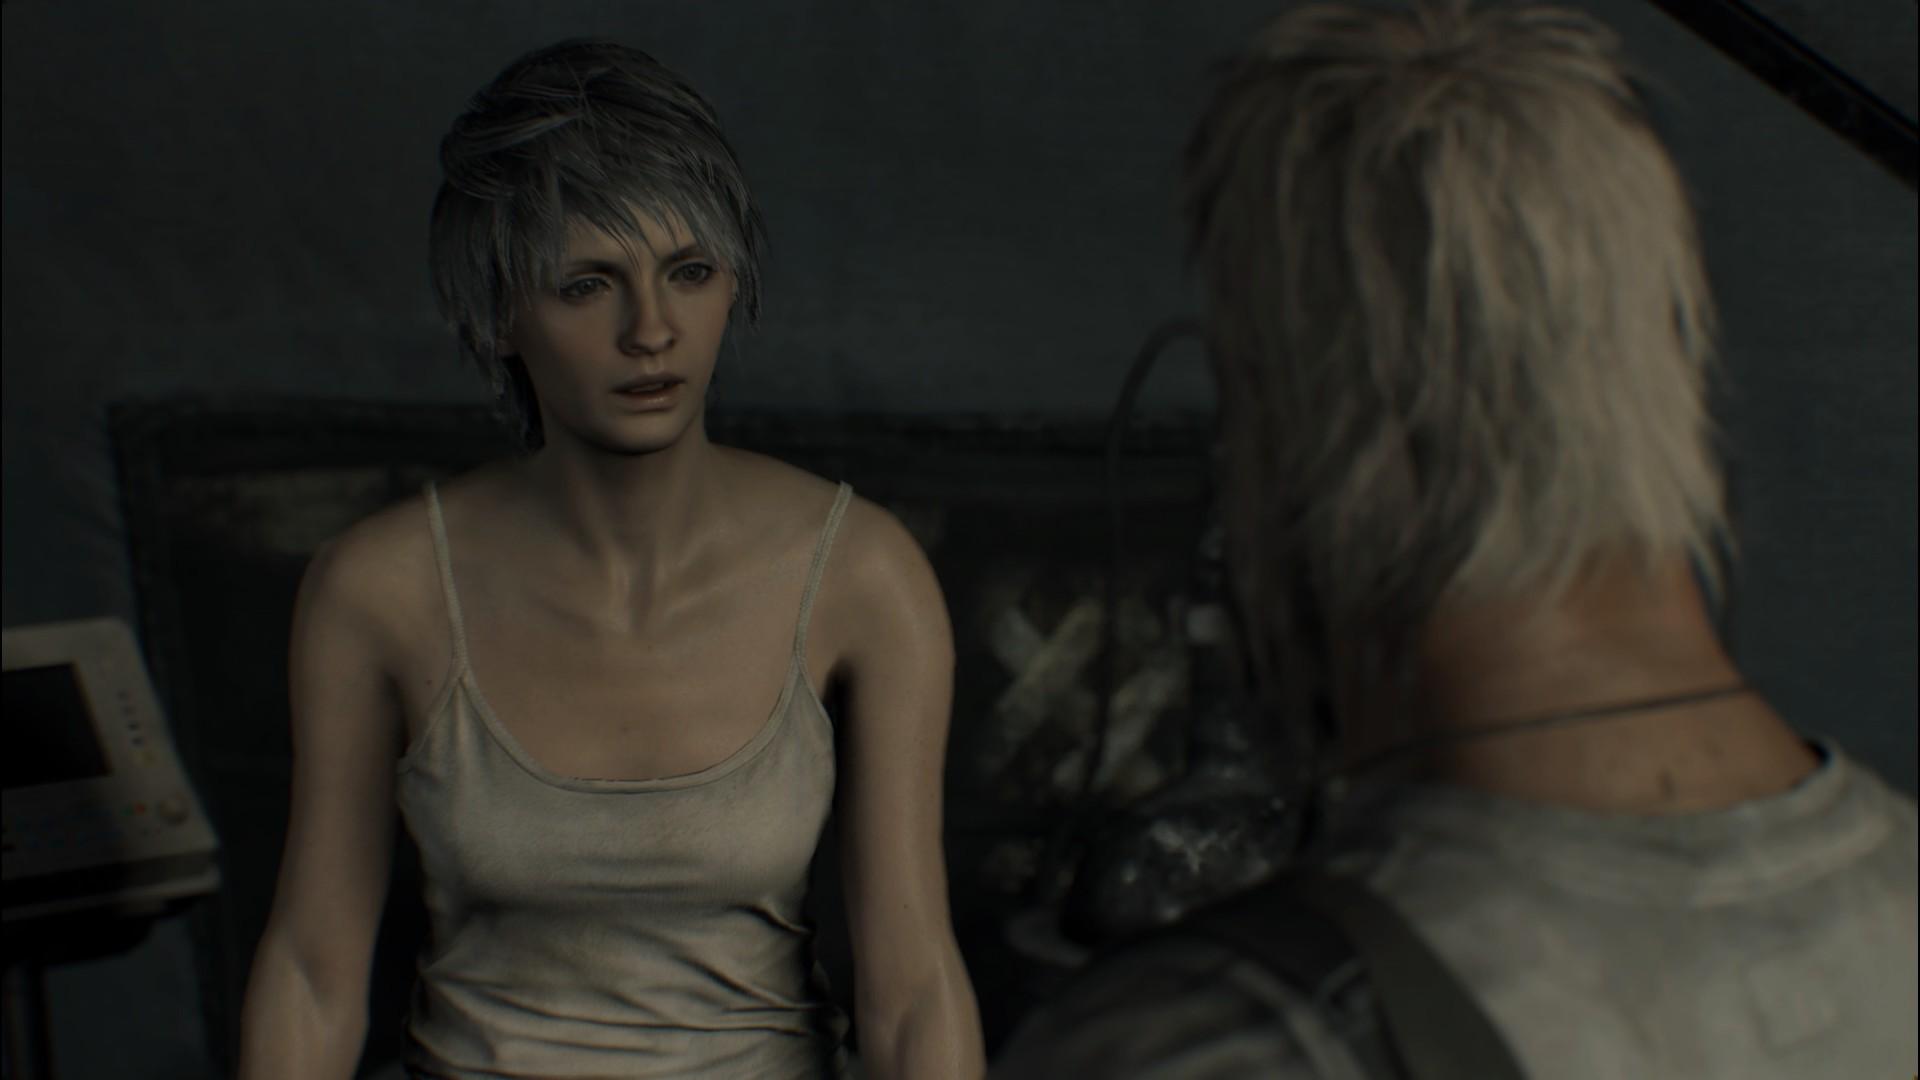 418370_screenshots_20171223191517_1.jpg - Resident Evil 7